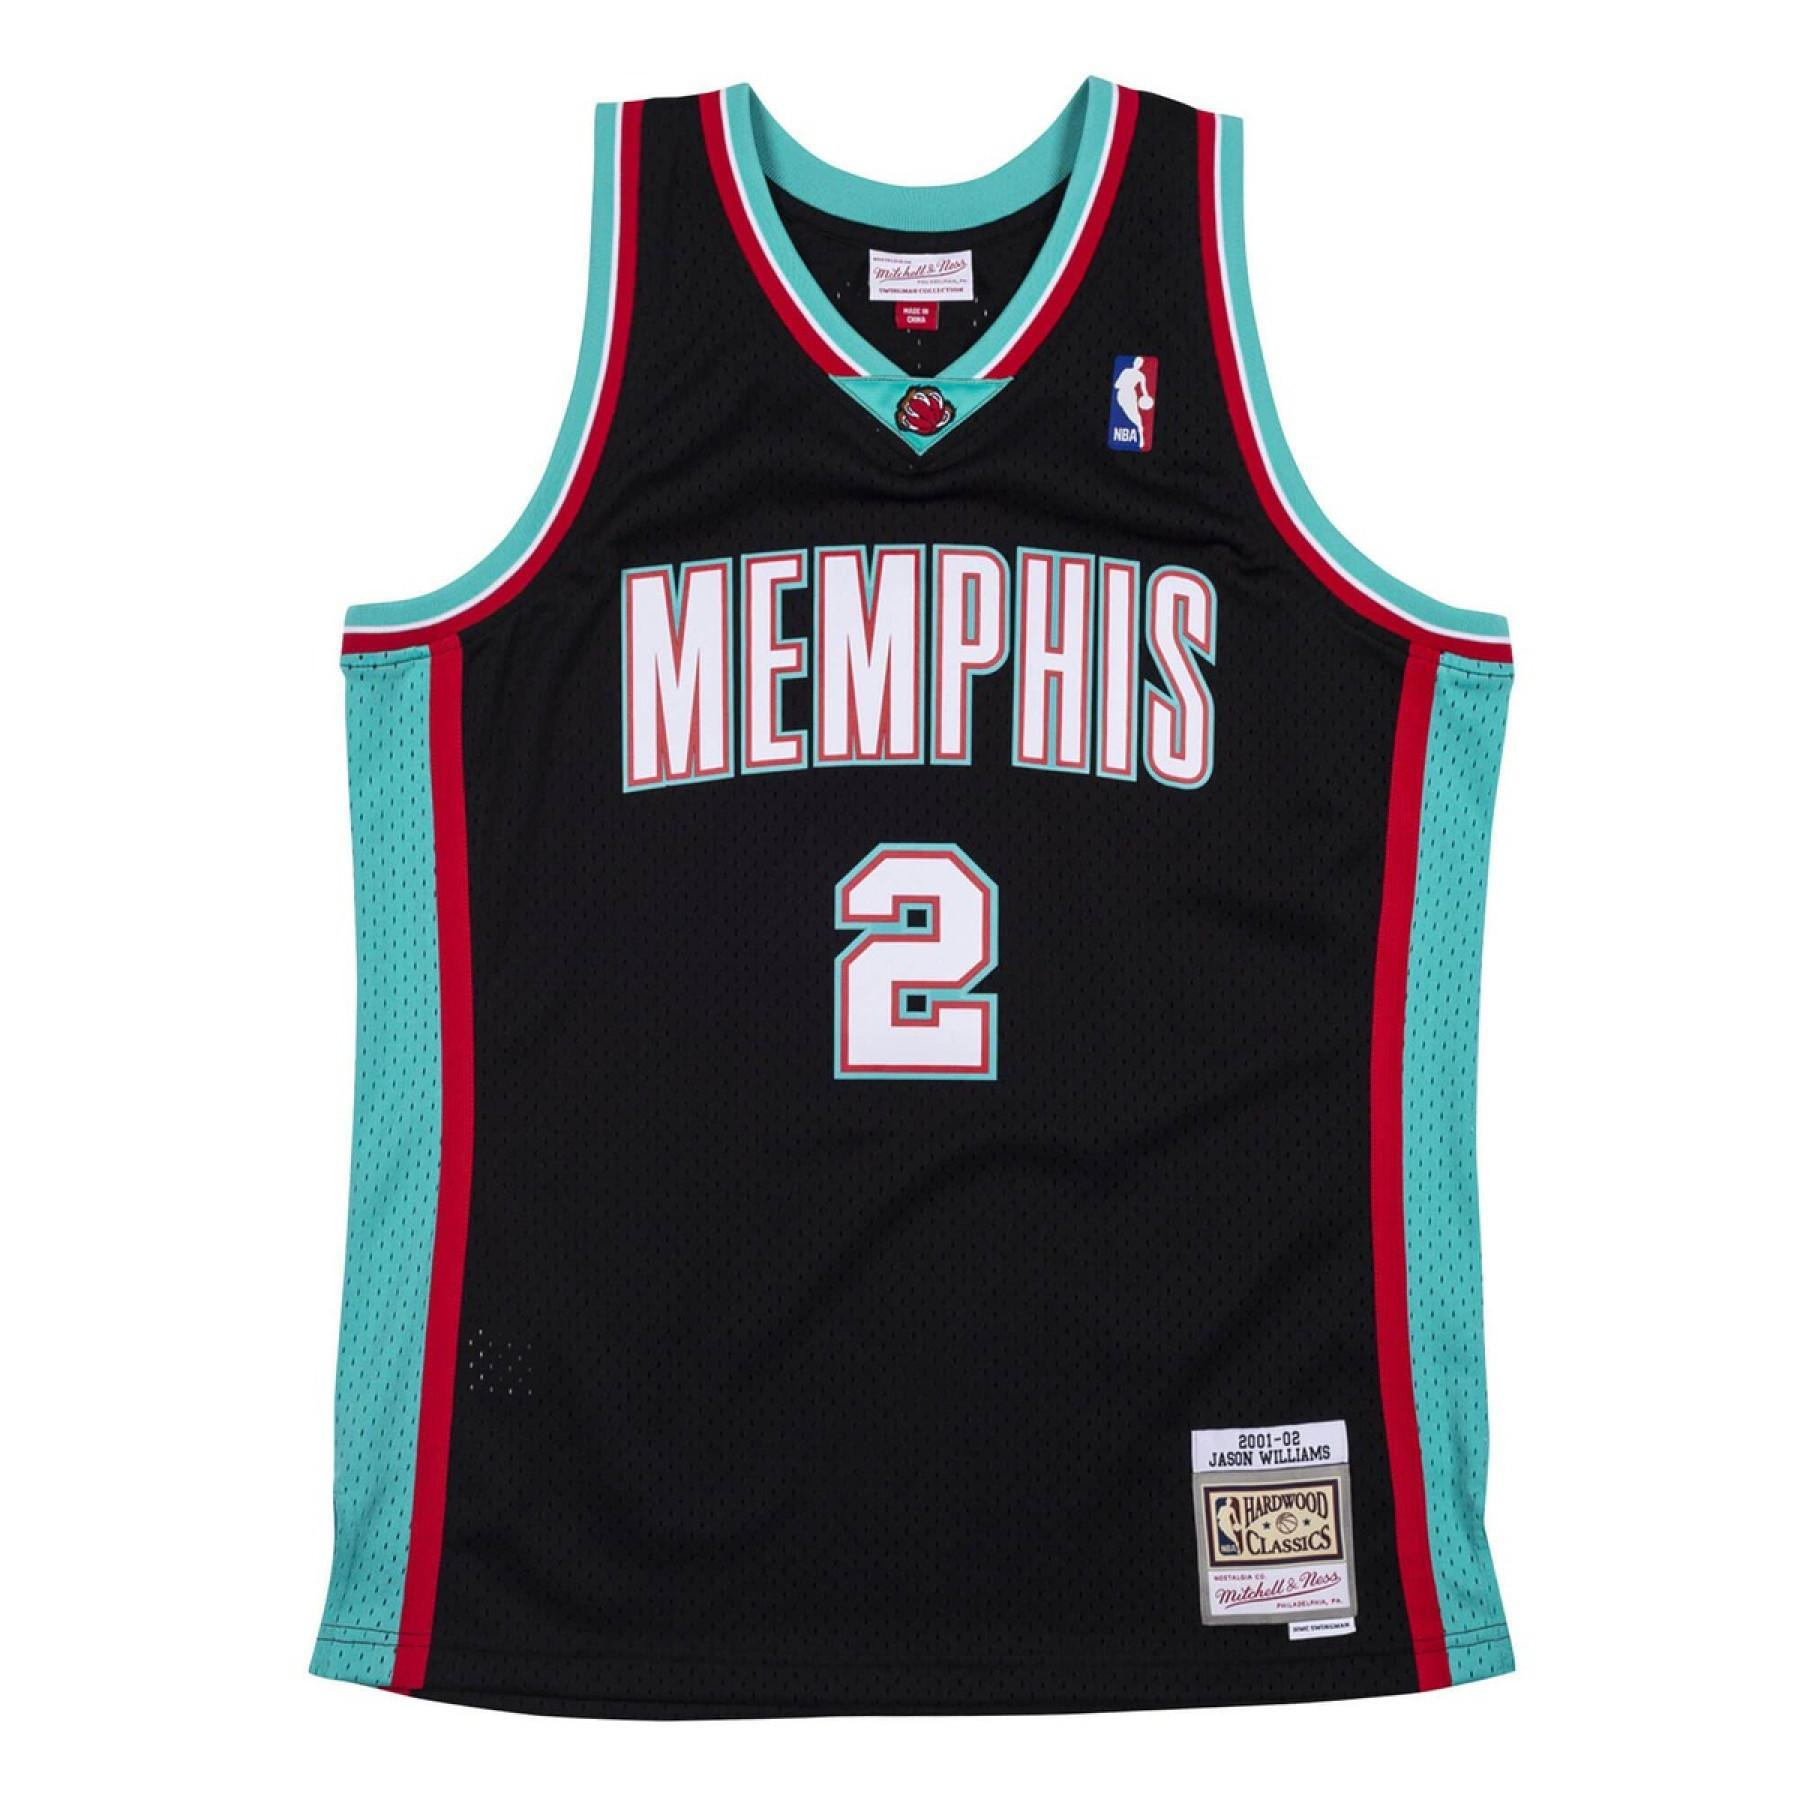 Memphis Grizzlies jersey Jason Williams